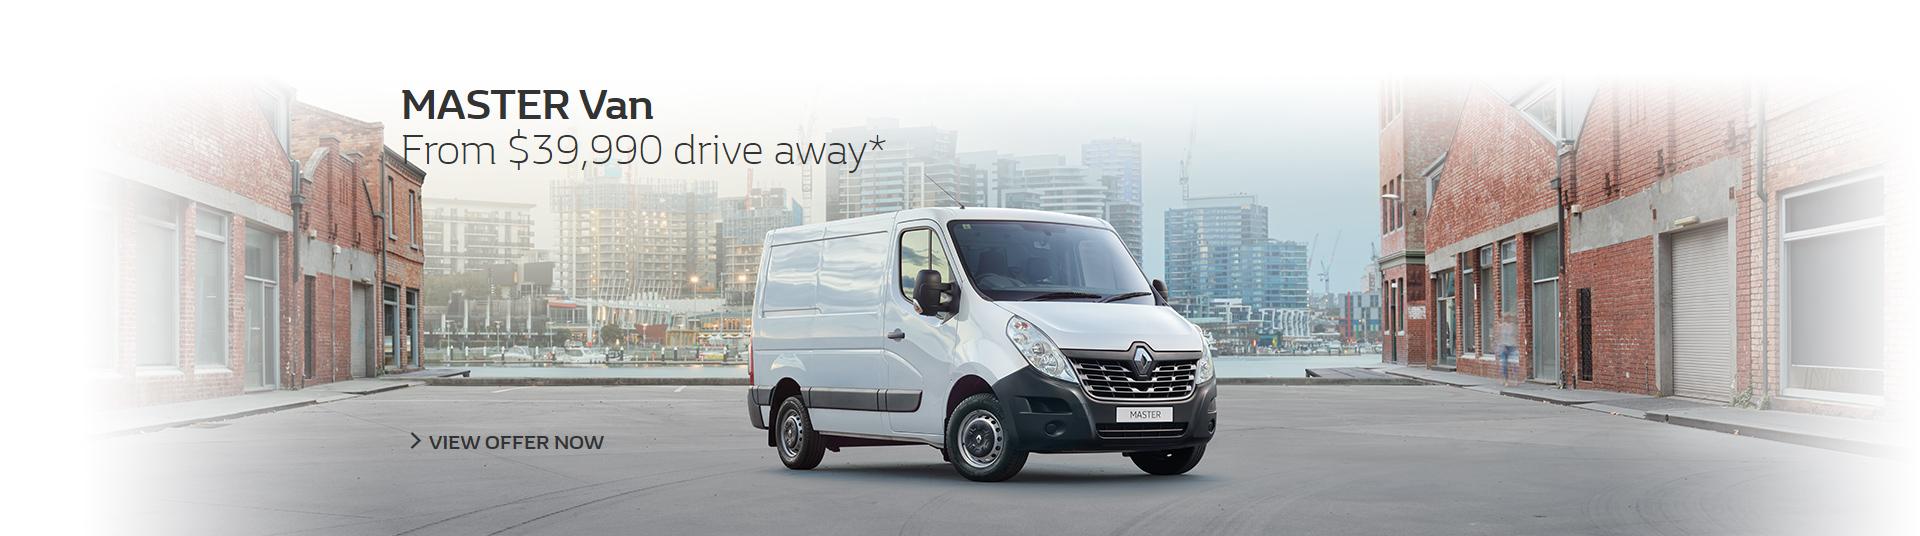 New Renault Master Van from $39,990 drive away at Metro Renault Brisbane.